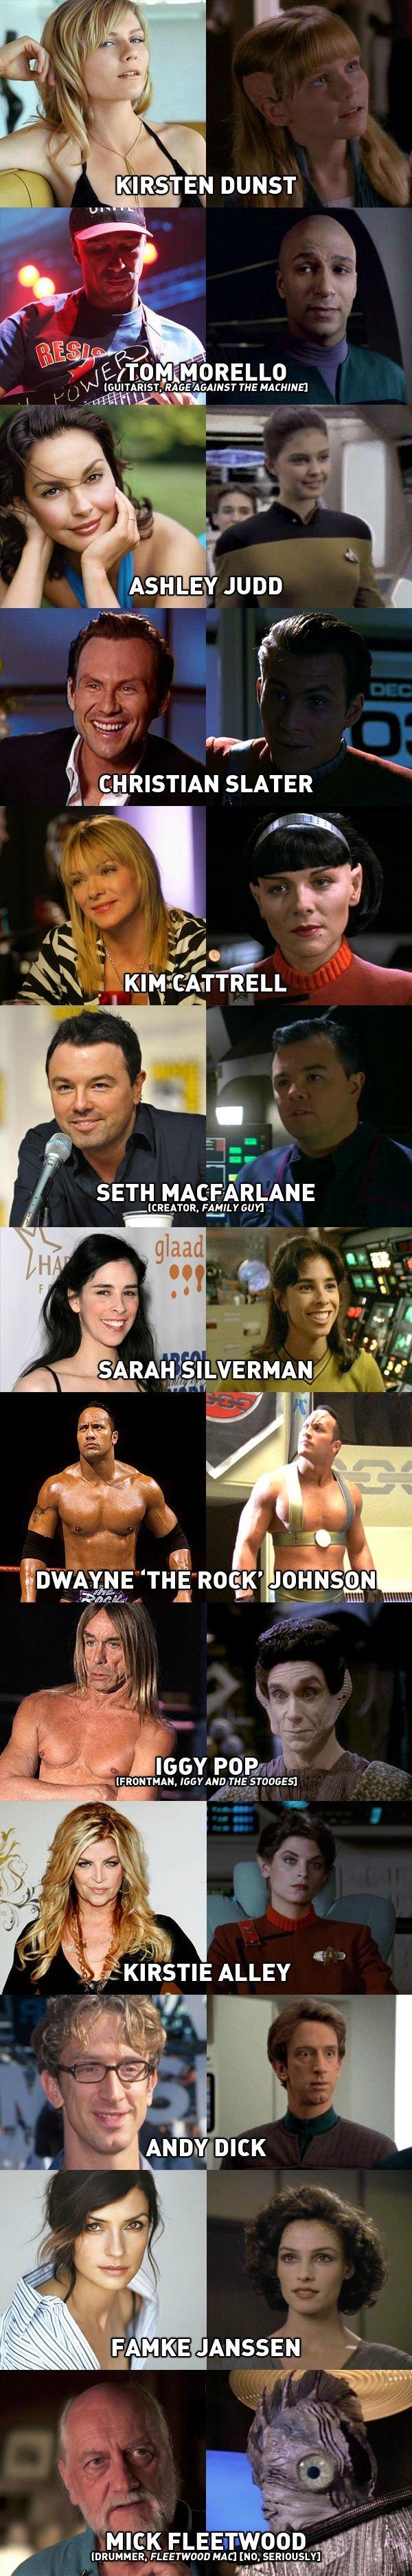 Star Trek Celebrities. Celebrities who has been on Star Trek.. THE MACHINE] SETH MACFARLANE lacuna THE 510055] 25 ANA 3 MICK FLEETWOOD I. 'iill, ', FLEETWOOD MA Star Trek Celebrities